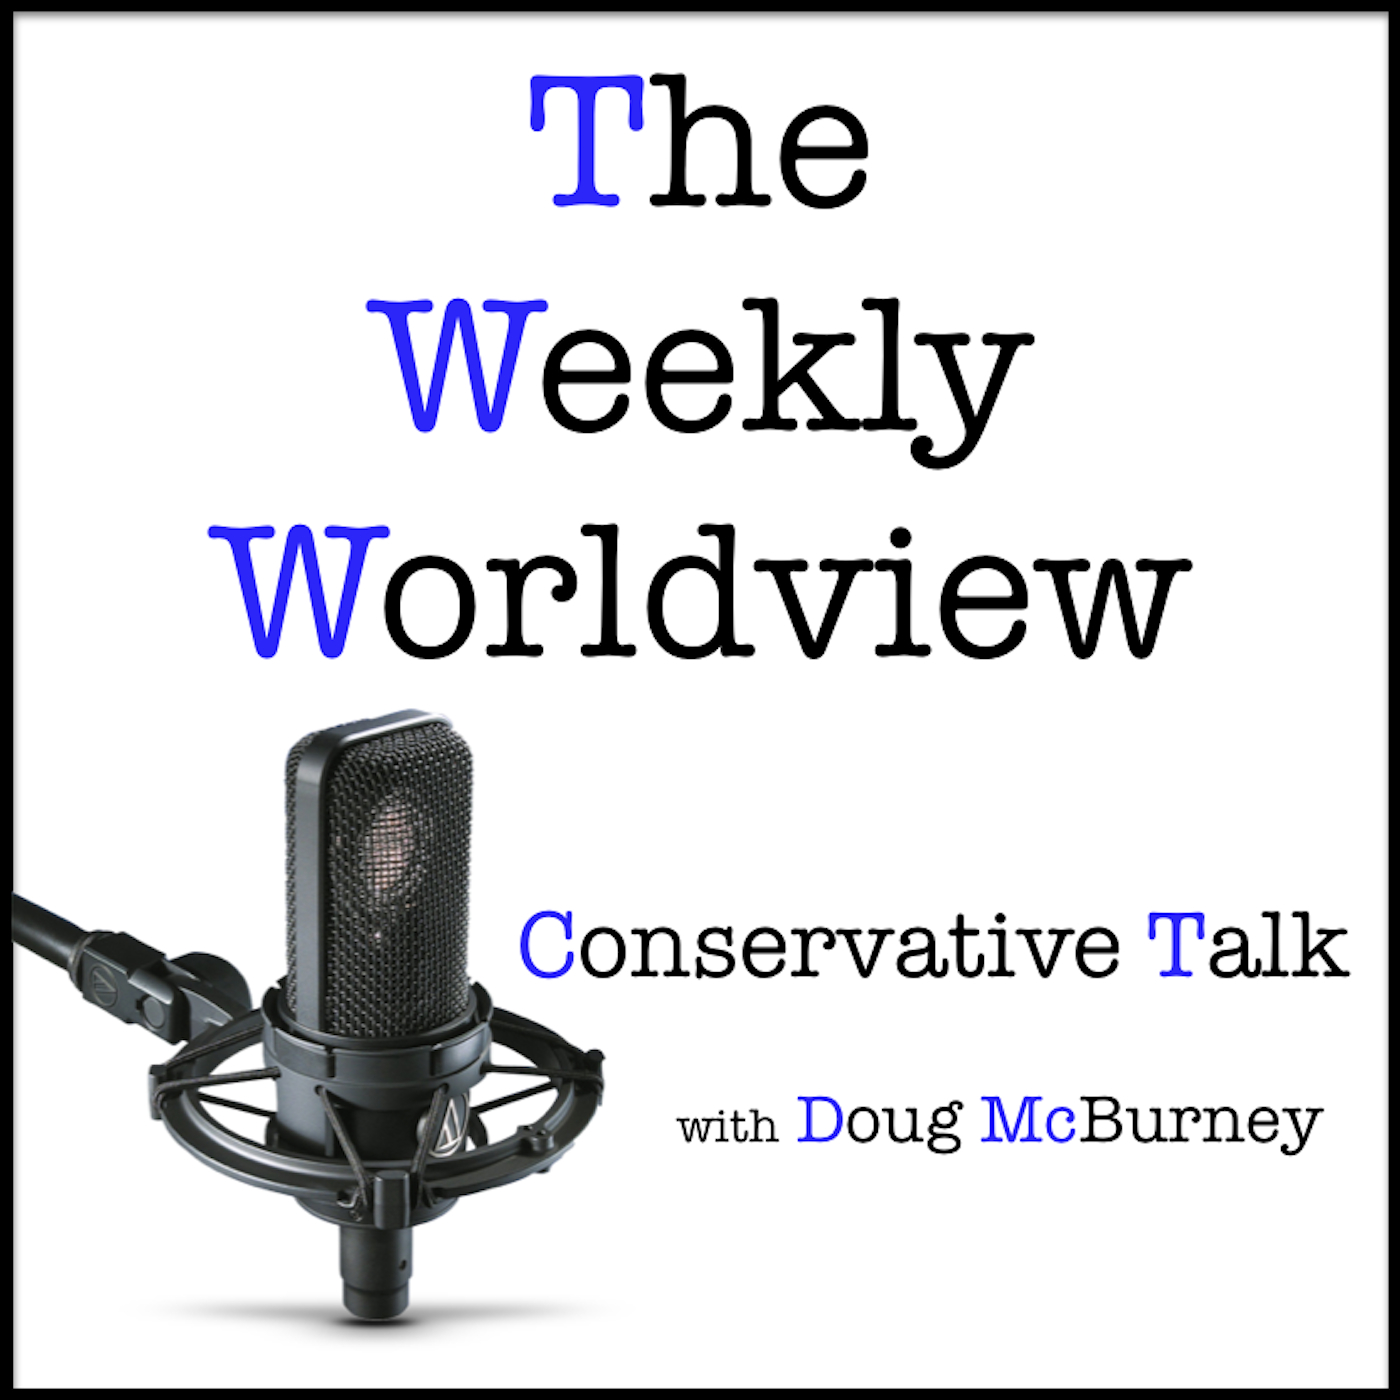 theweeklyworldview.com